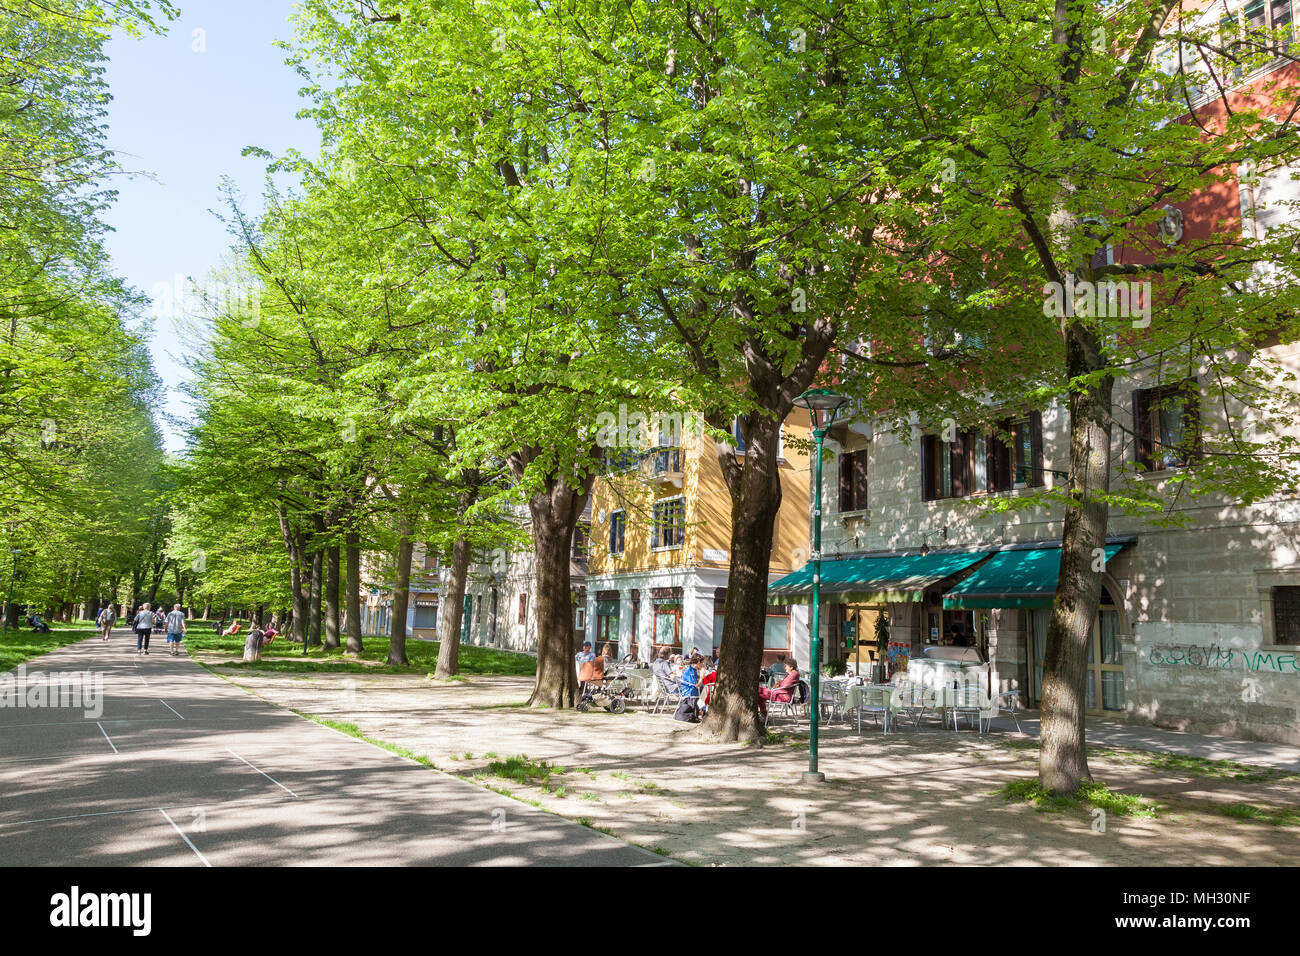 Spring in Venice. Fresh green trees in the Parco della Rimembranze along Viale 1V Novembre, Sant'Elena, Venice, Veneto, Italy, Open air retsaurant - Stock Image